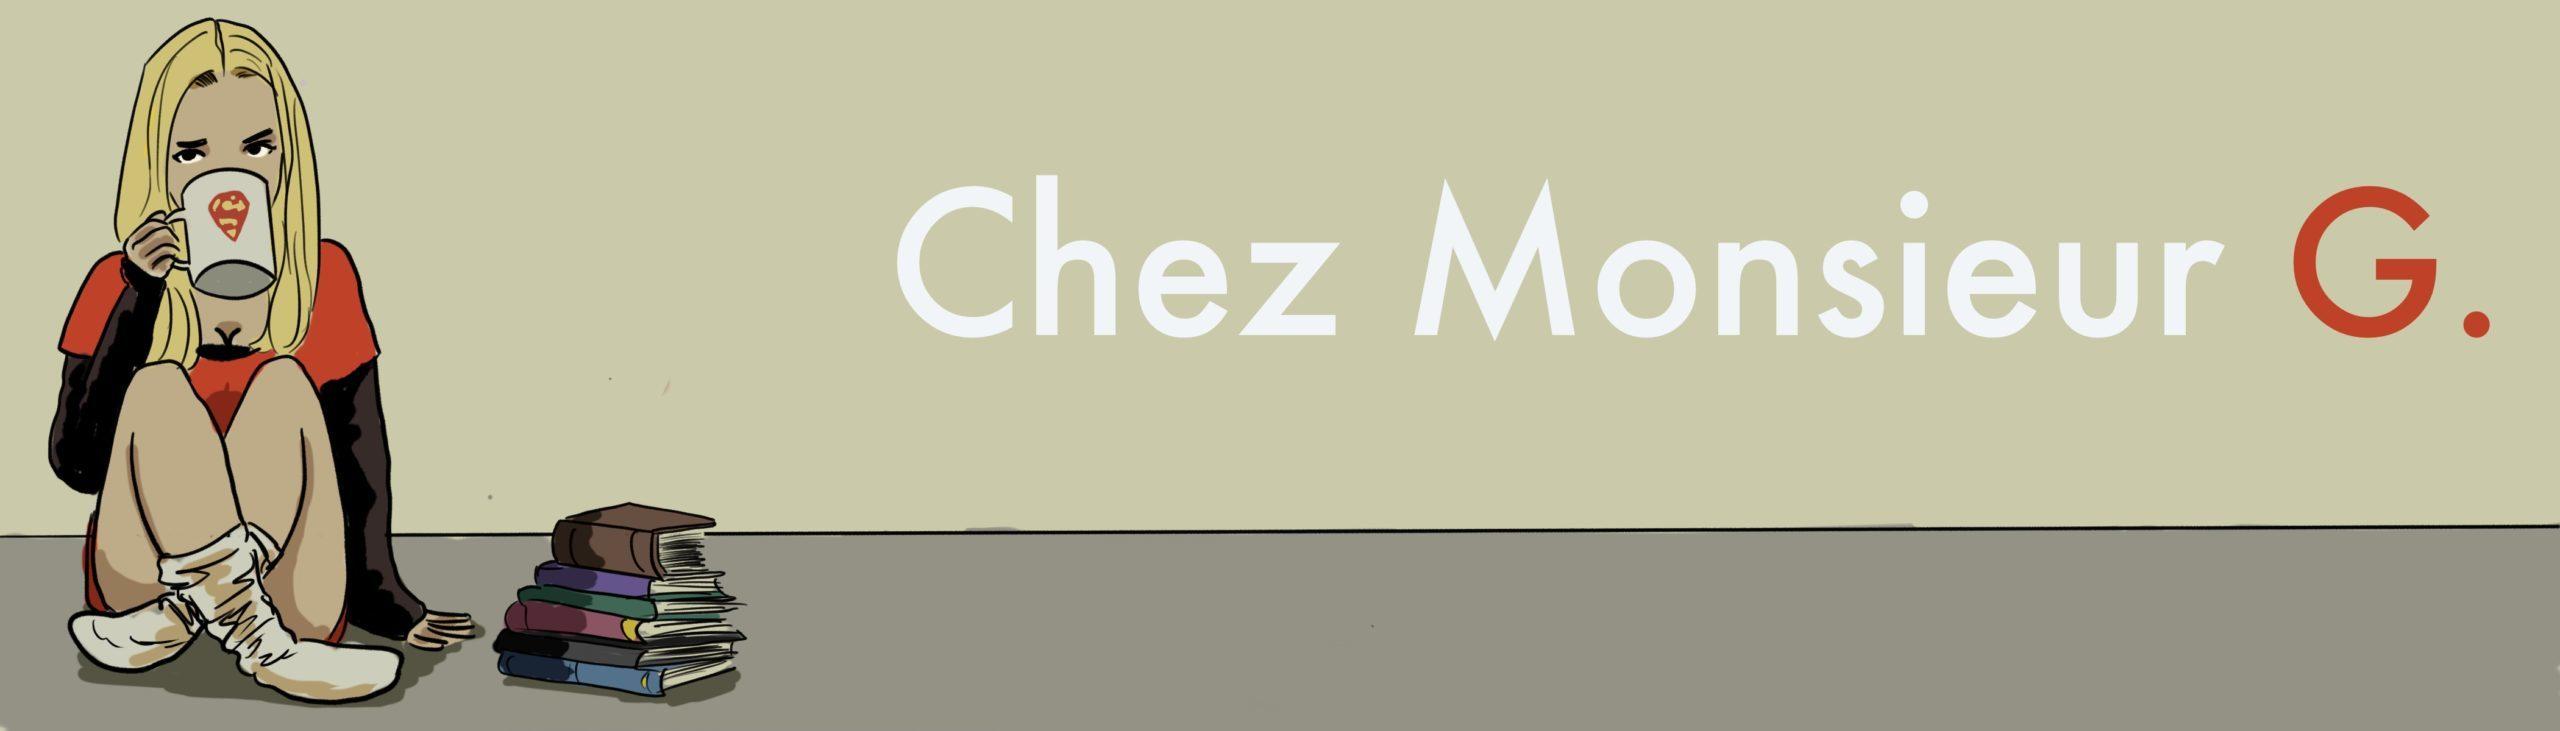 Chez Monsieur G.